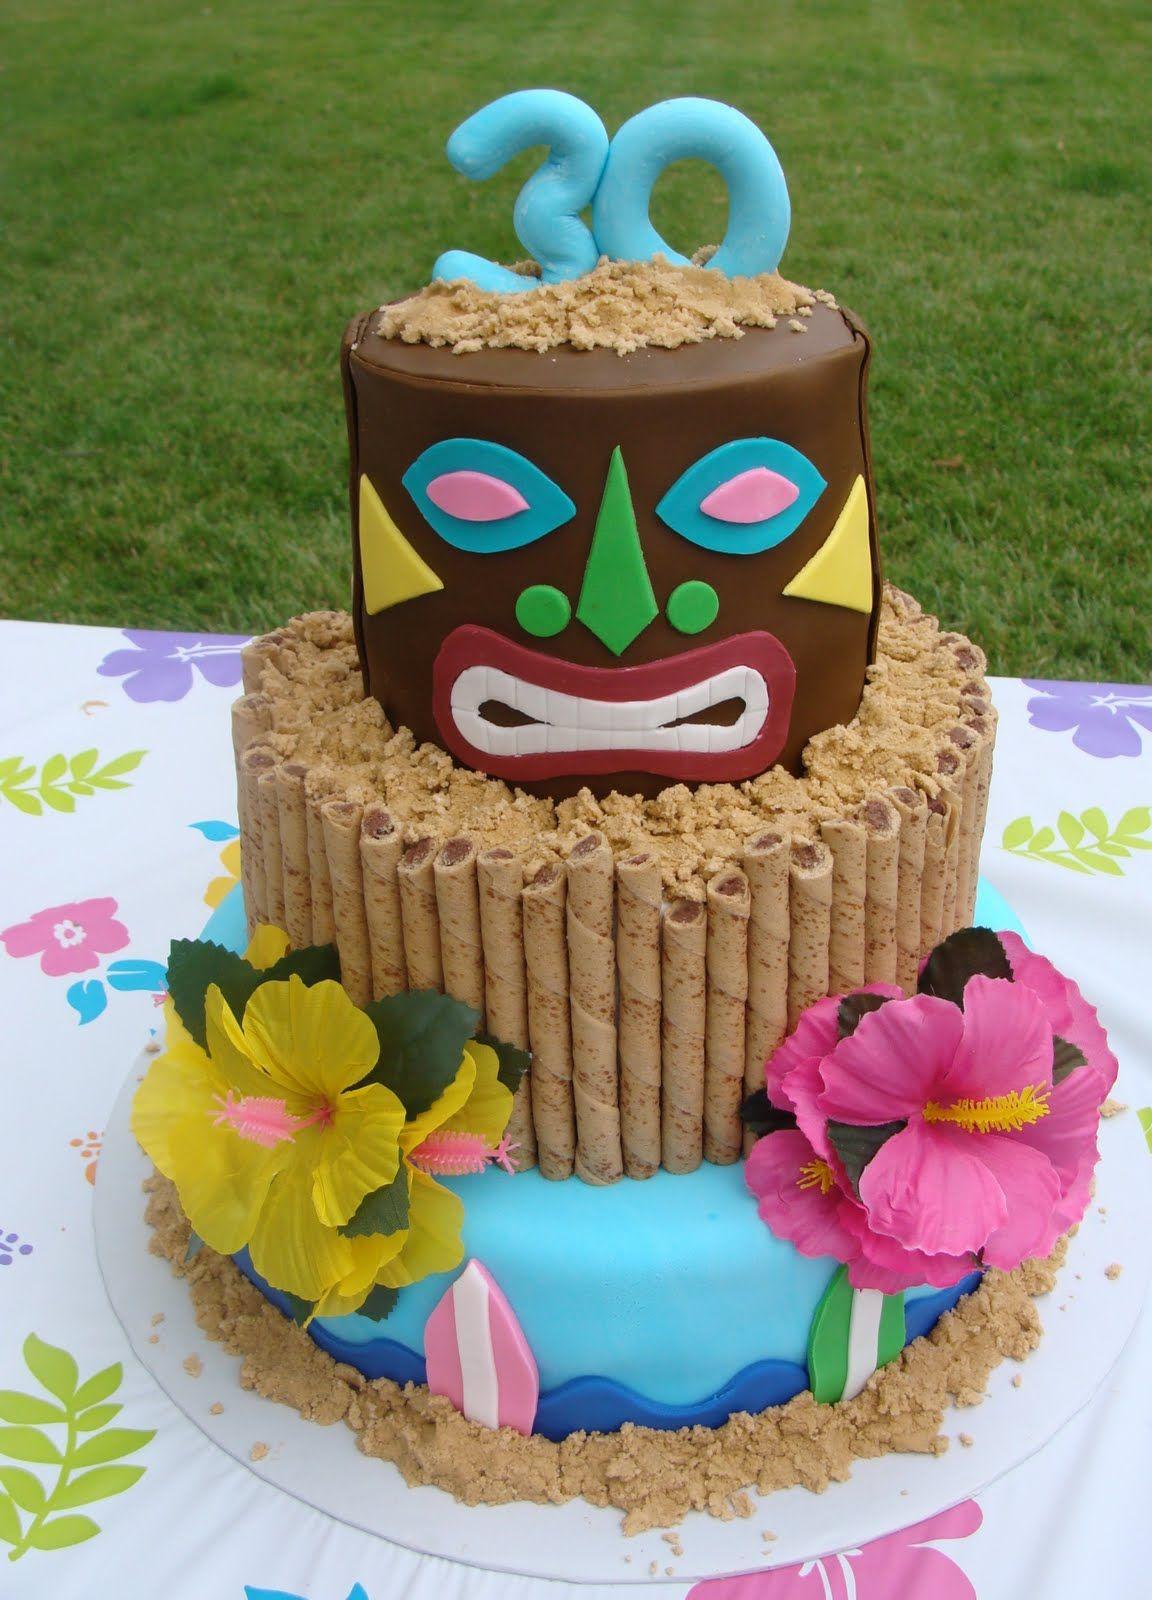 Hawaiian Luau Hawaii Decorated Cake Decorated Cakes Pinterest